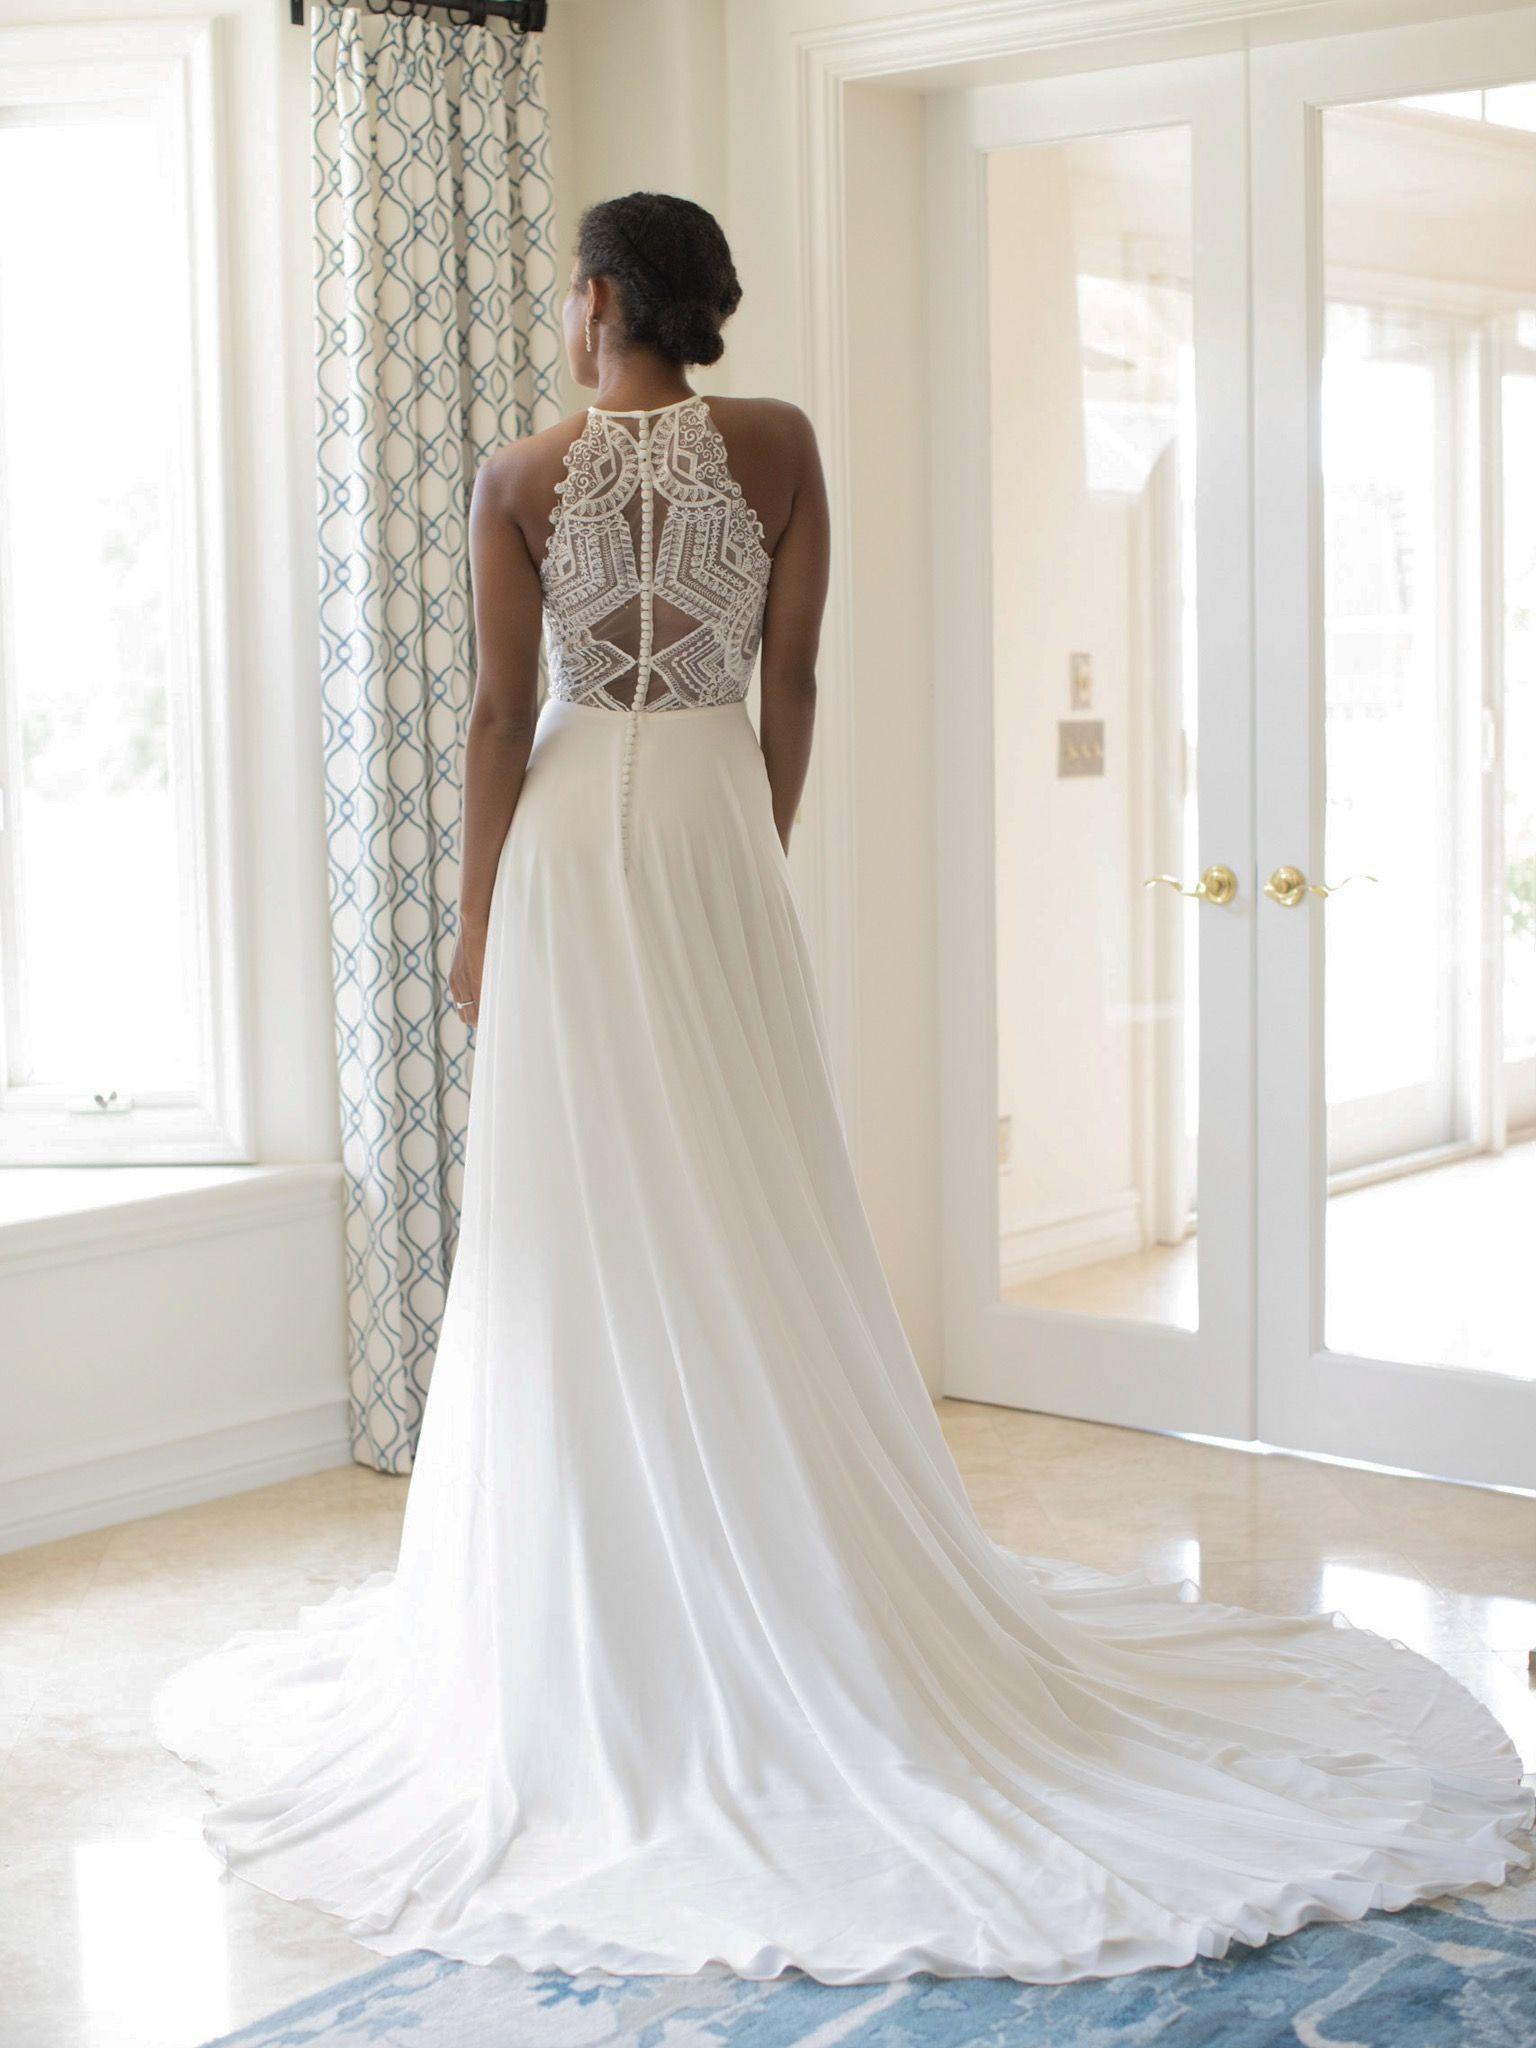 Evelyn Bridal Rylan S191305 Wedding Gown Chic Chiffon A Line Wedding Dress With A Decorati Geometric Wedding Dress Chiffon Wedding Gowns Wedding Dresses Lace [ 2048 x 1536 Pixel ]